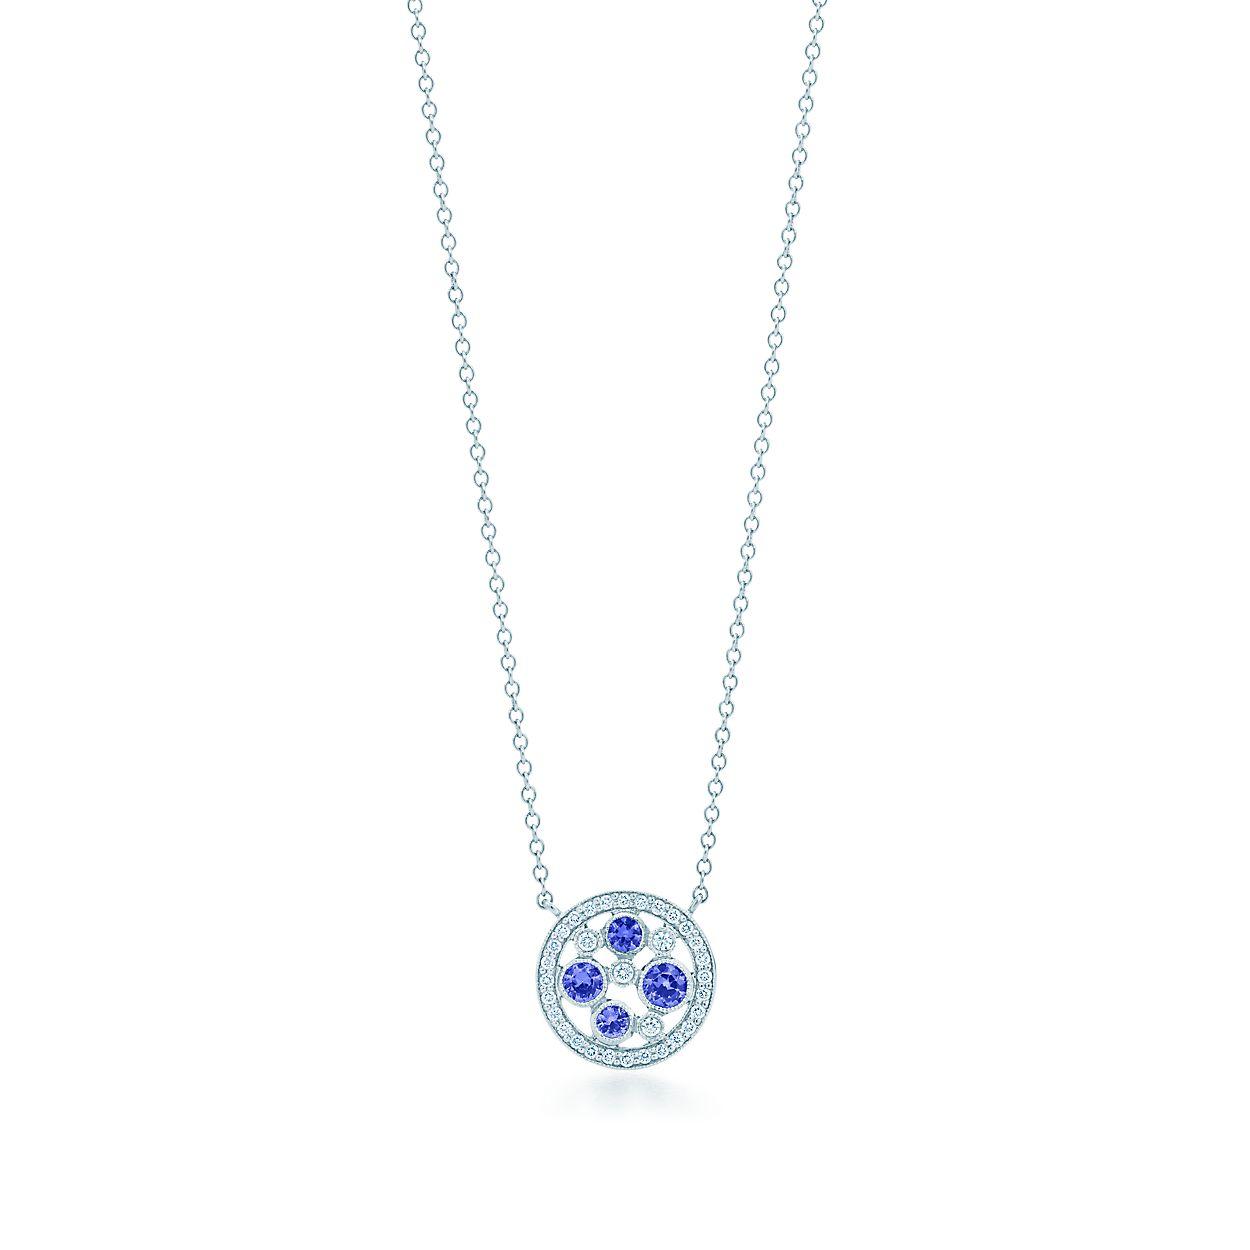 5ed6098c8 Tiffany Cobblestone Pendant In Platinum With Montana Sapphires